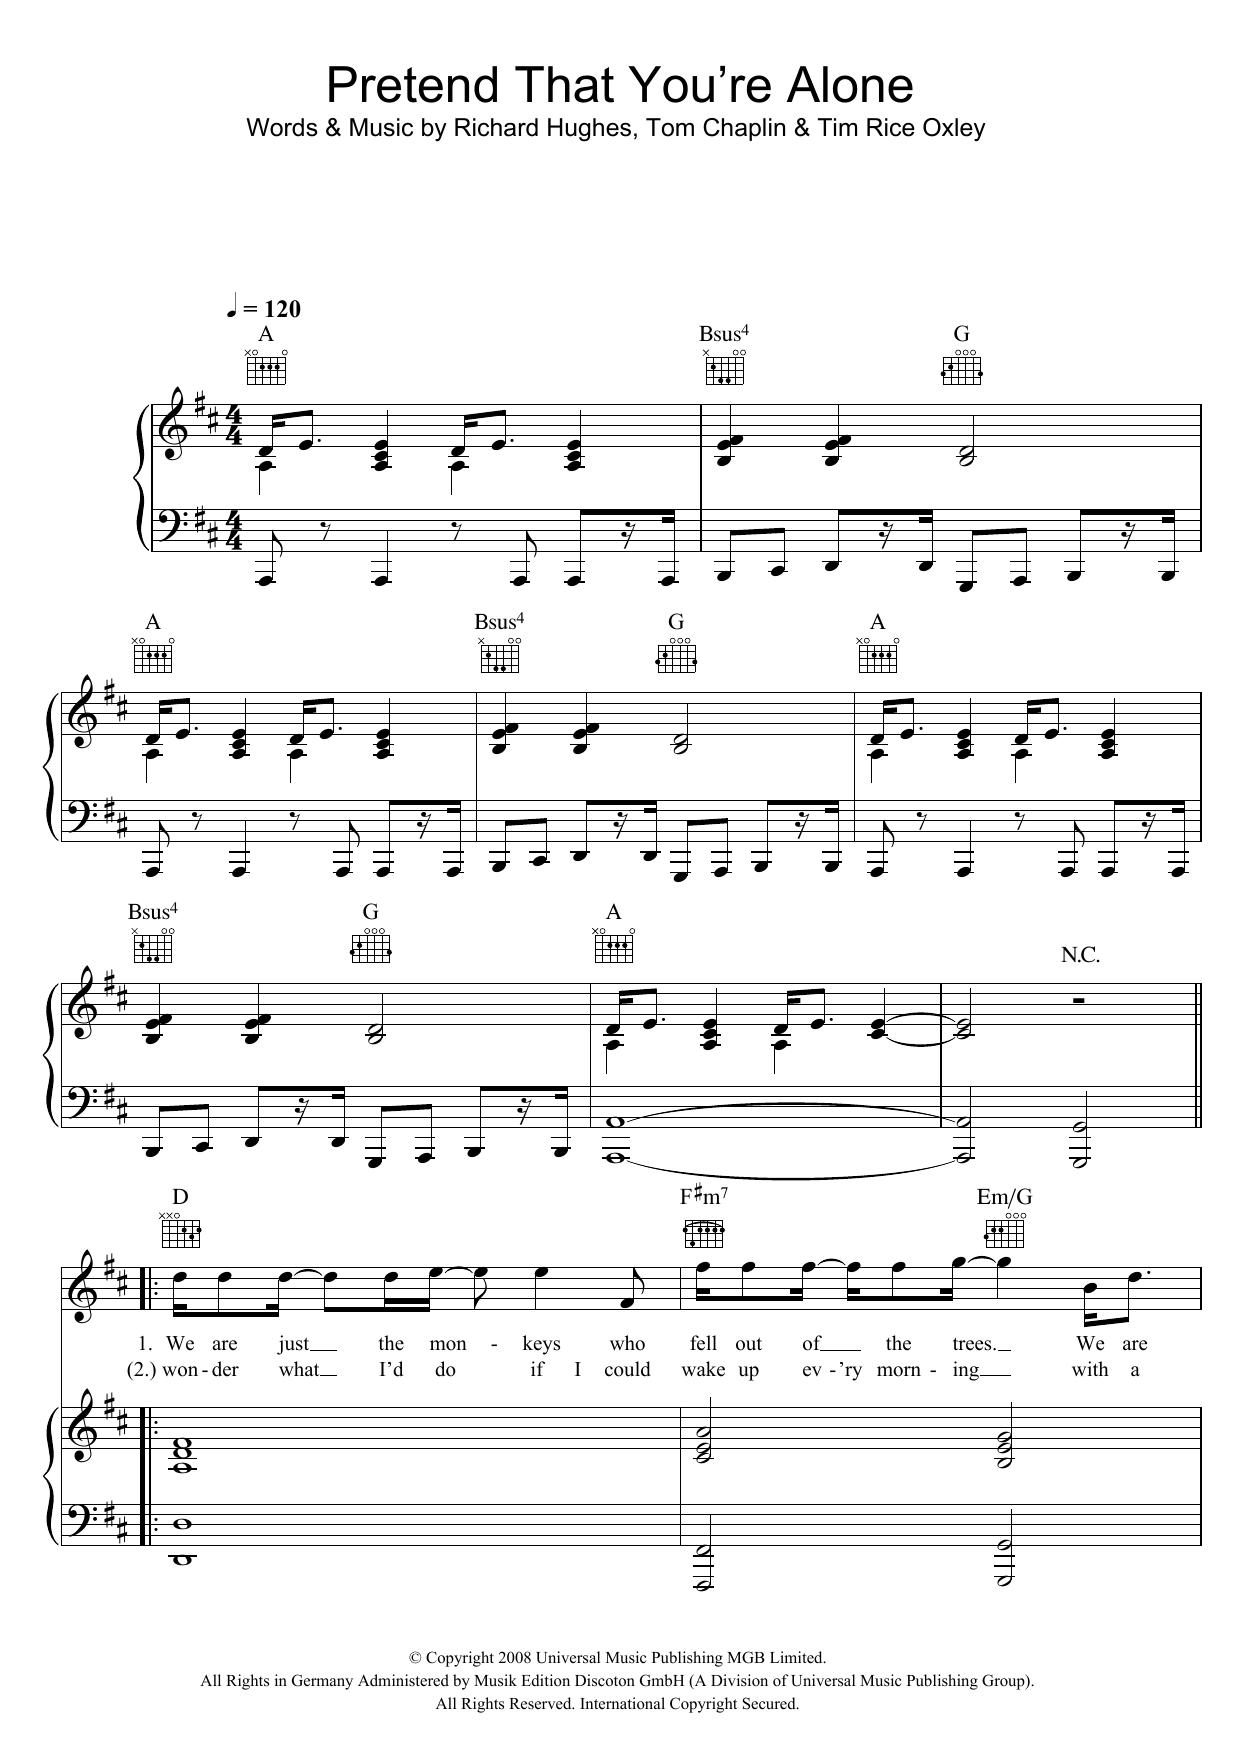 Pretend That You're Alone Sheet Music